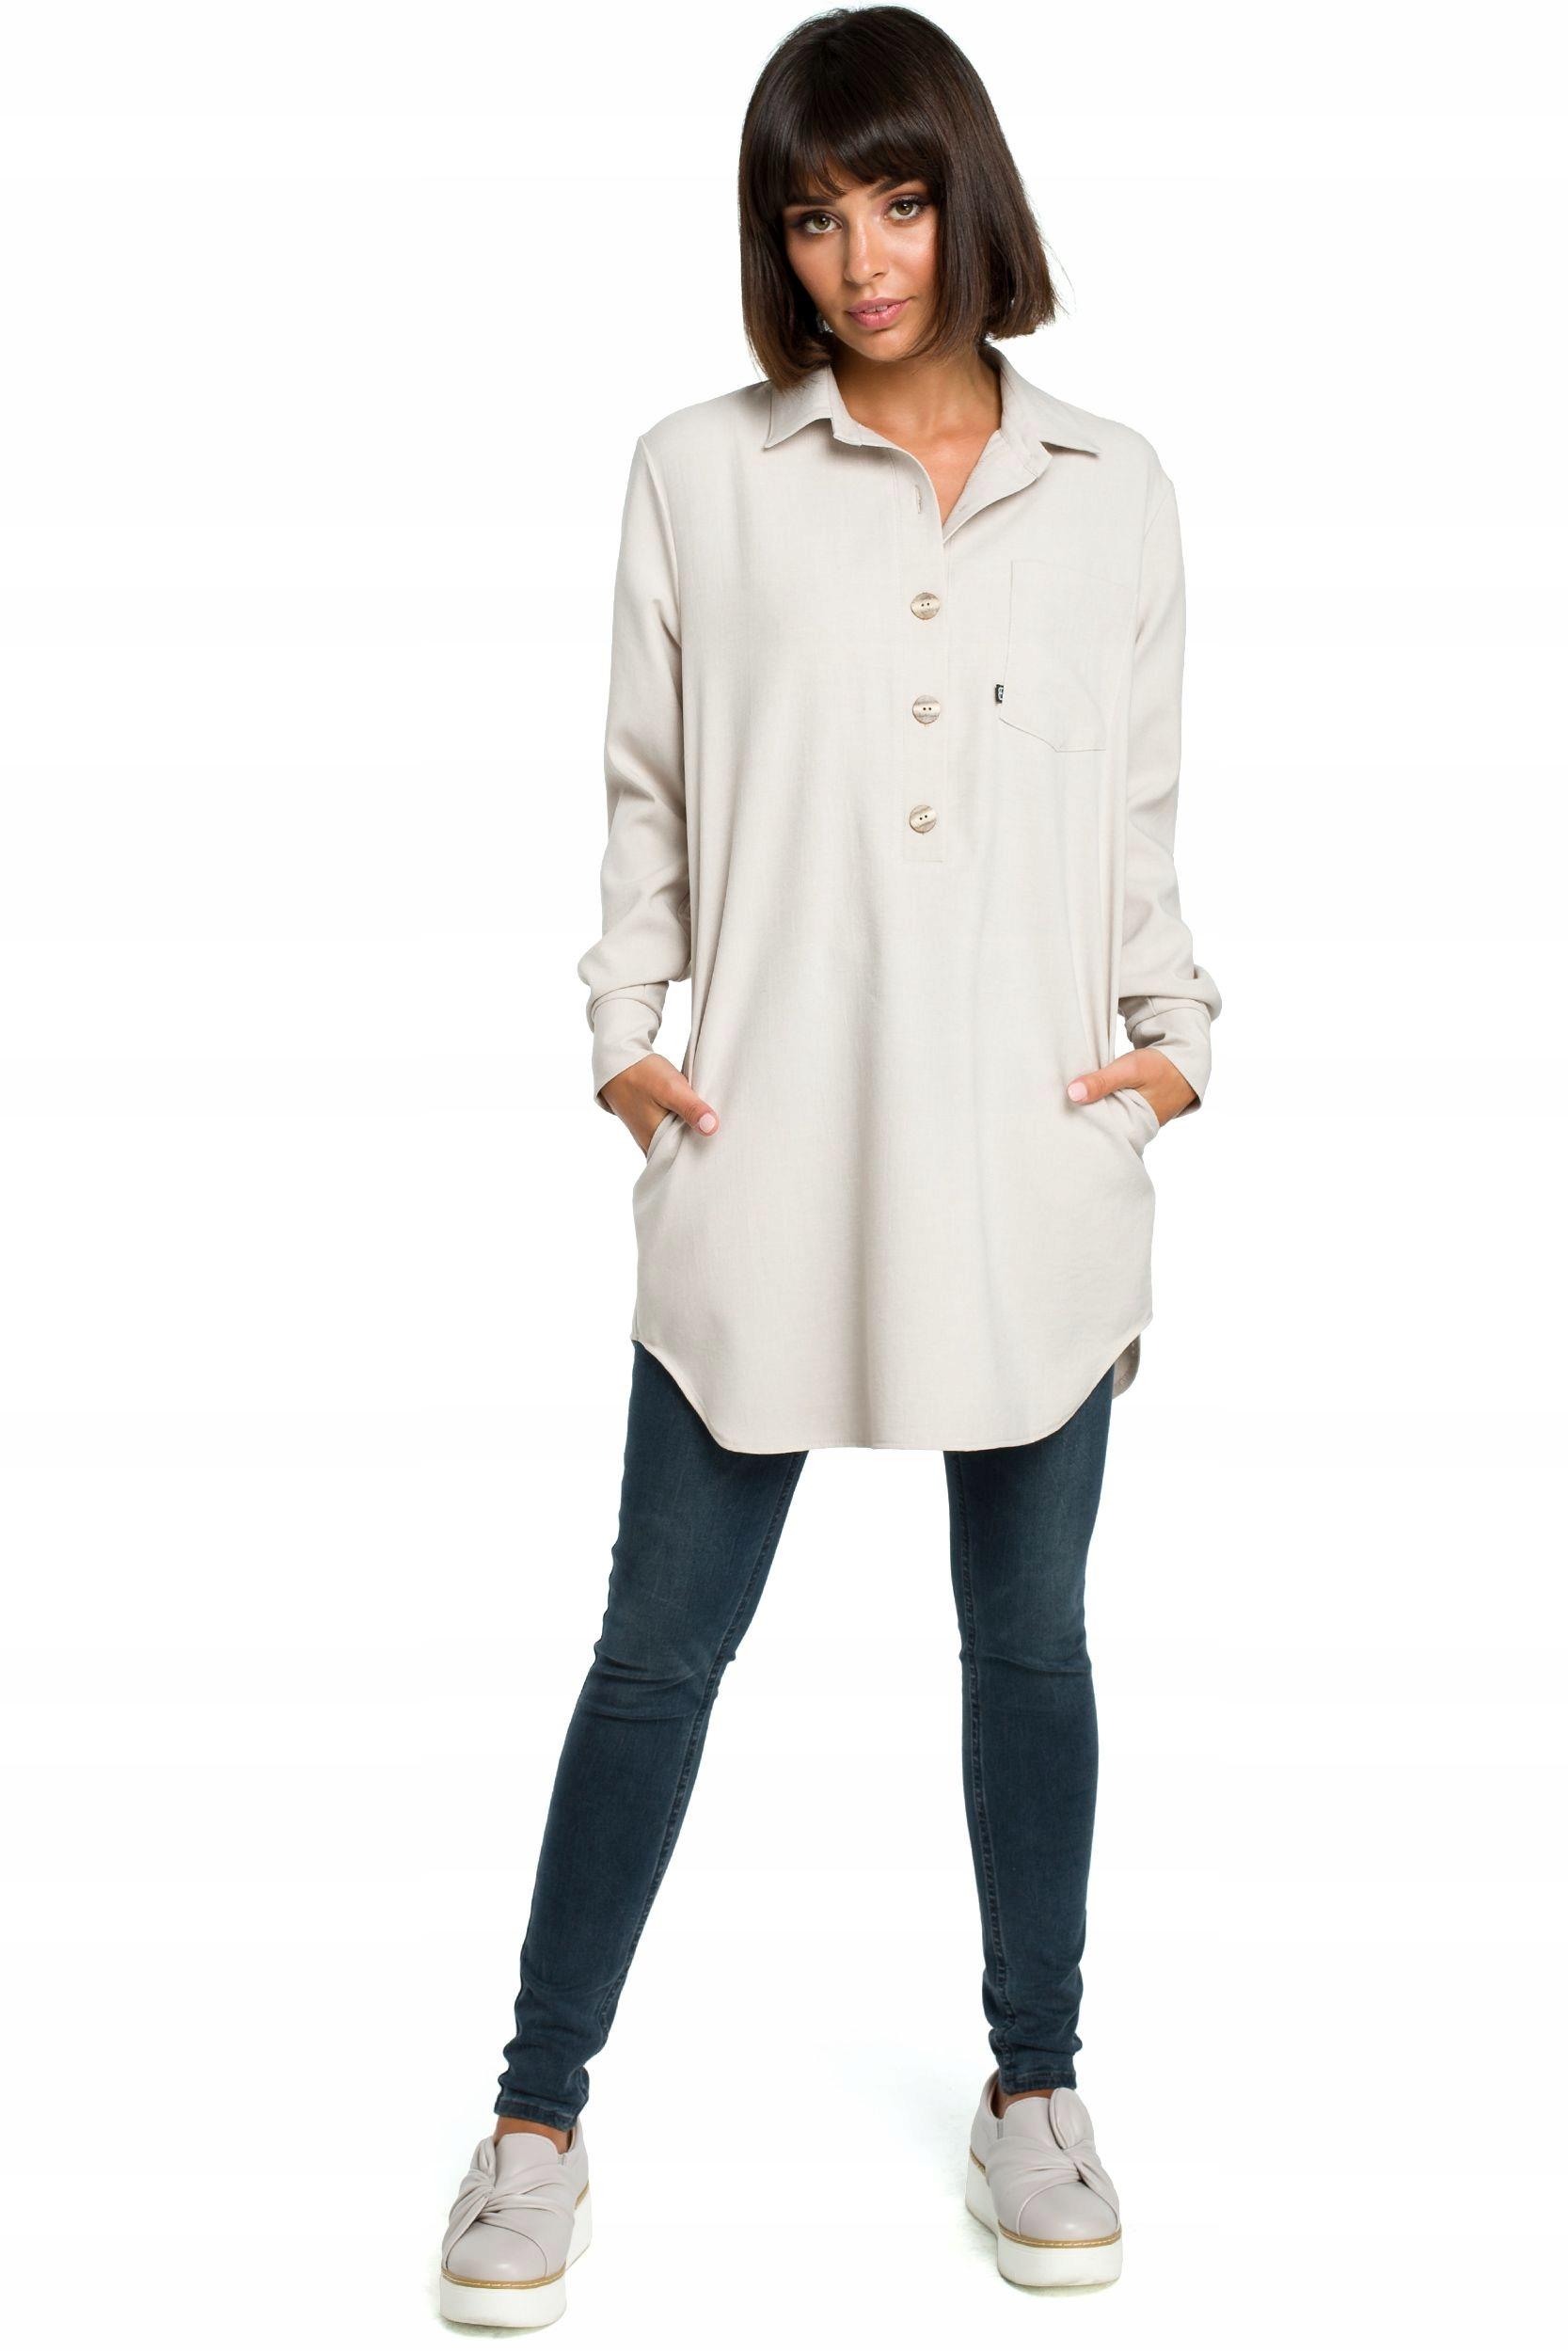 B086 Tunika koszulowa - beżowa S/m